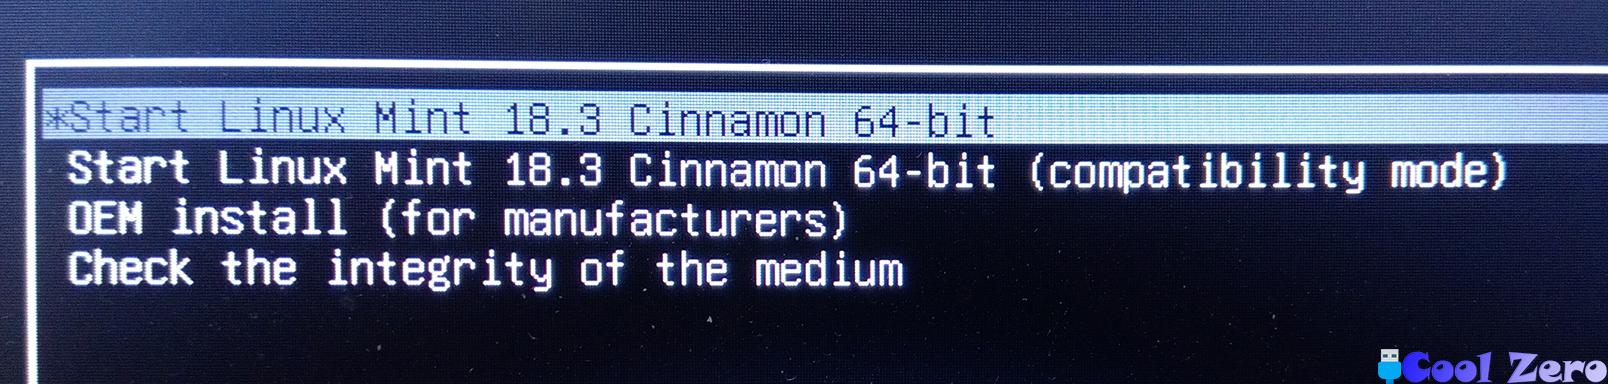 Меню загрузки Linux Mint